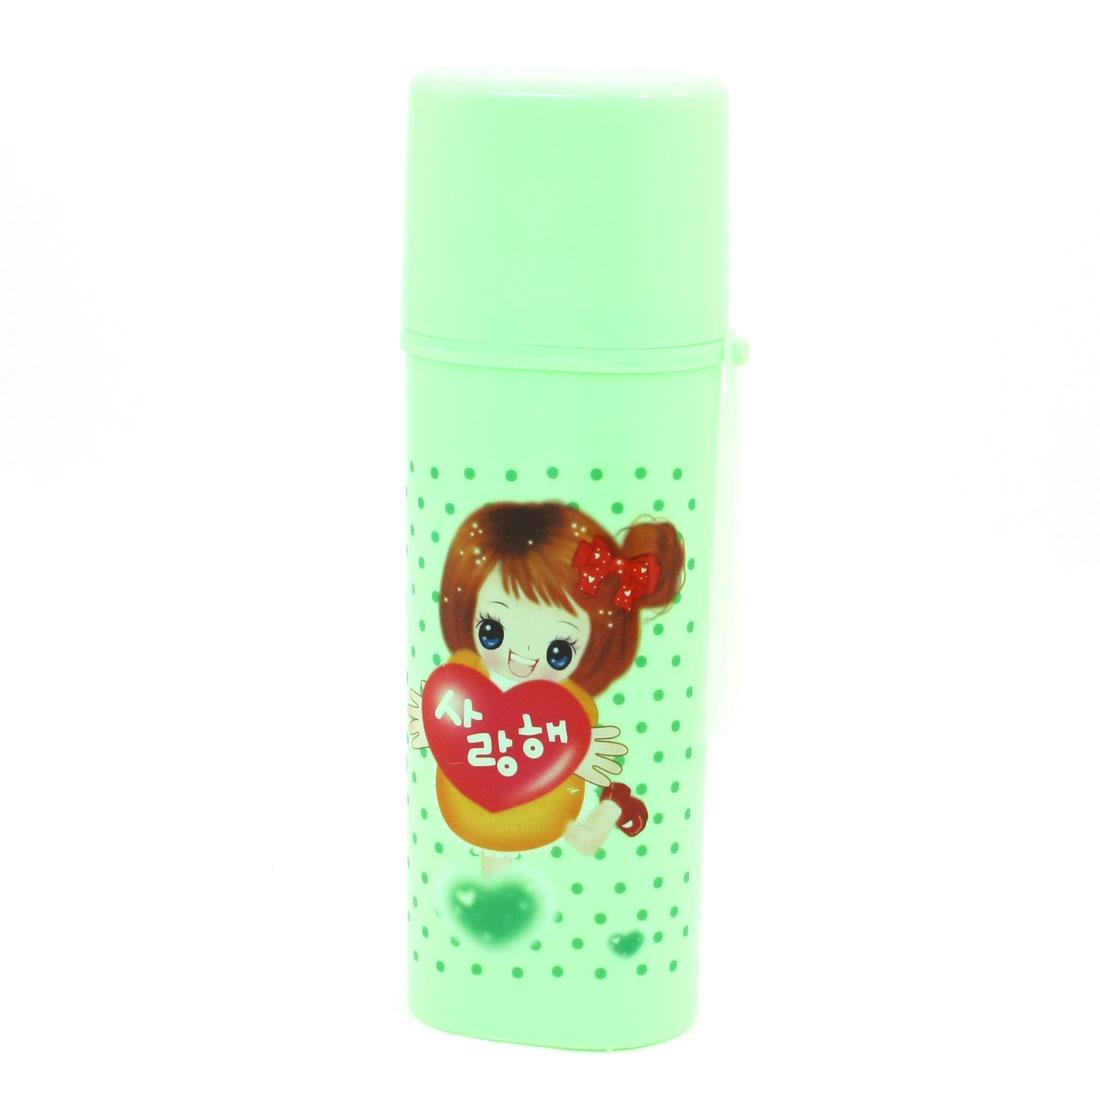 Travel Toothbrush Toothpaste Holder Case Plastic Capped Bottle Green